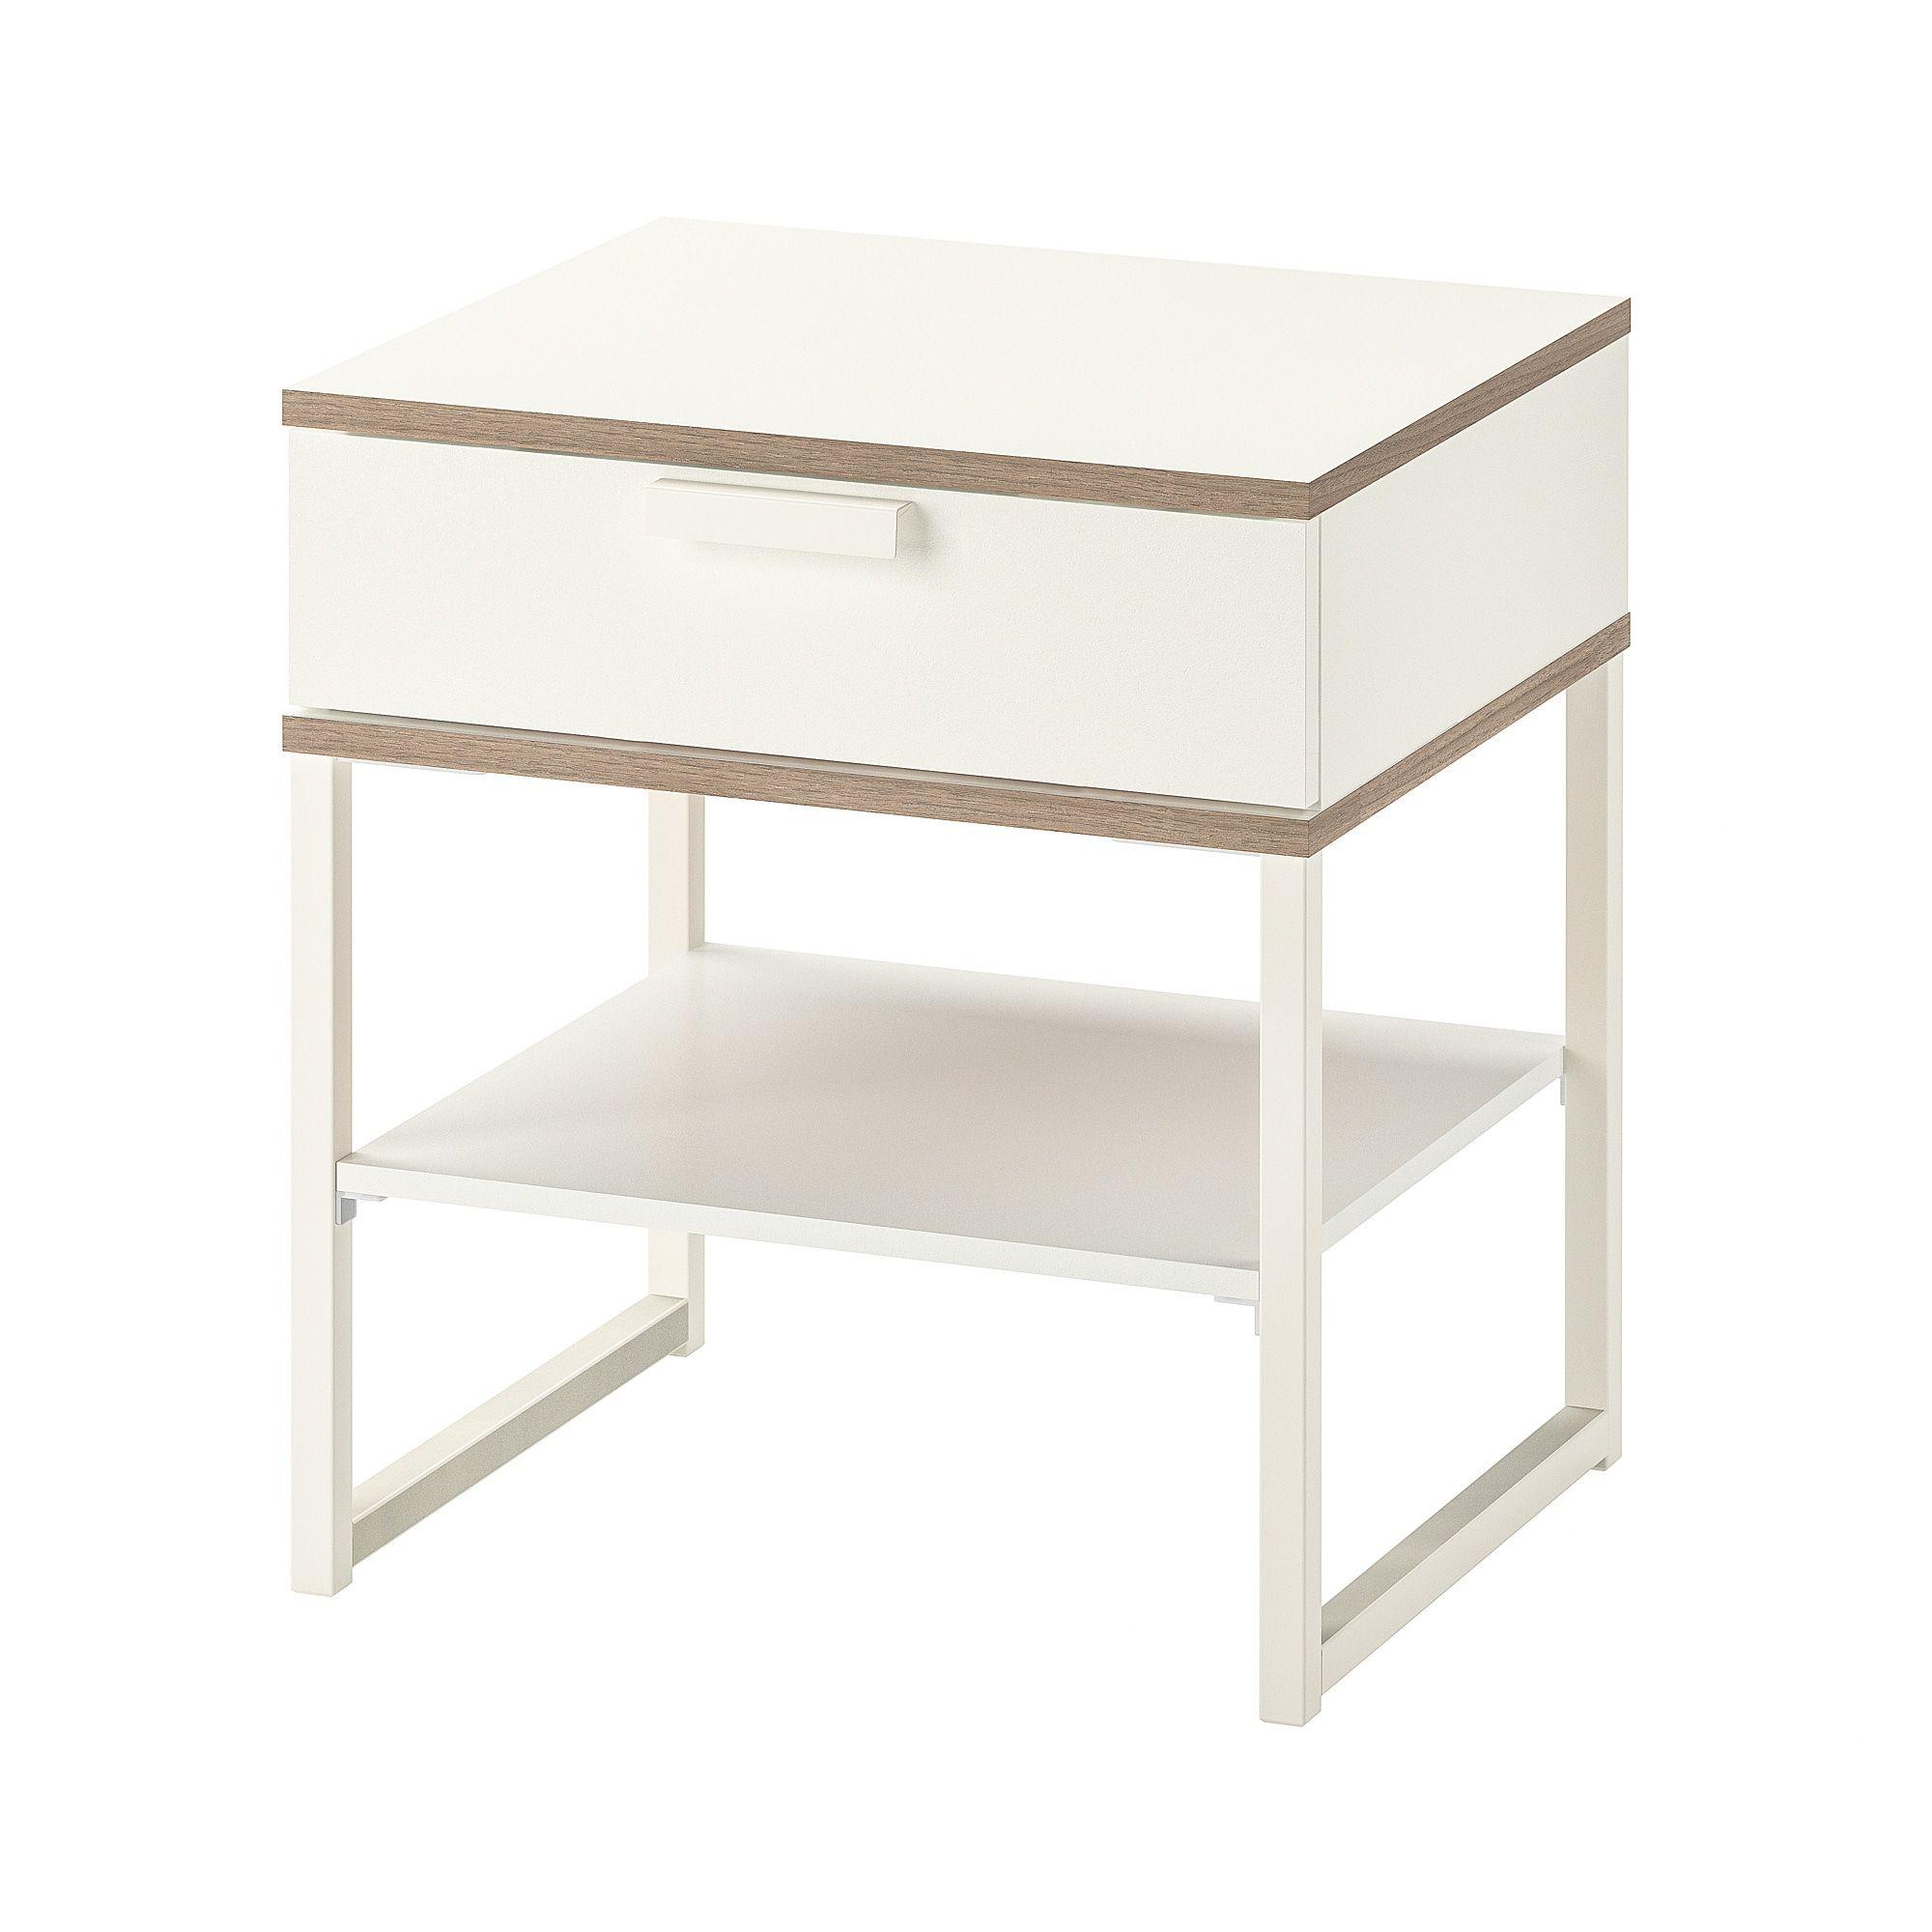 Trysil Bedside Table White Light Grey Ikea Ablagetisch Nachttisch Weiss Ikea